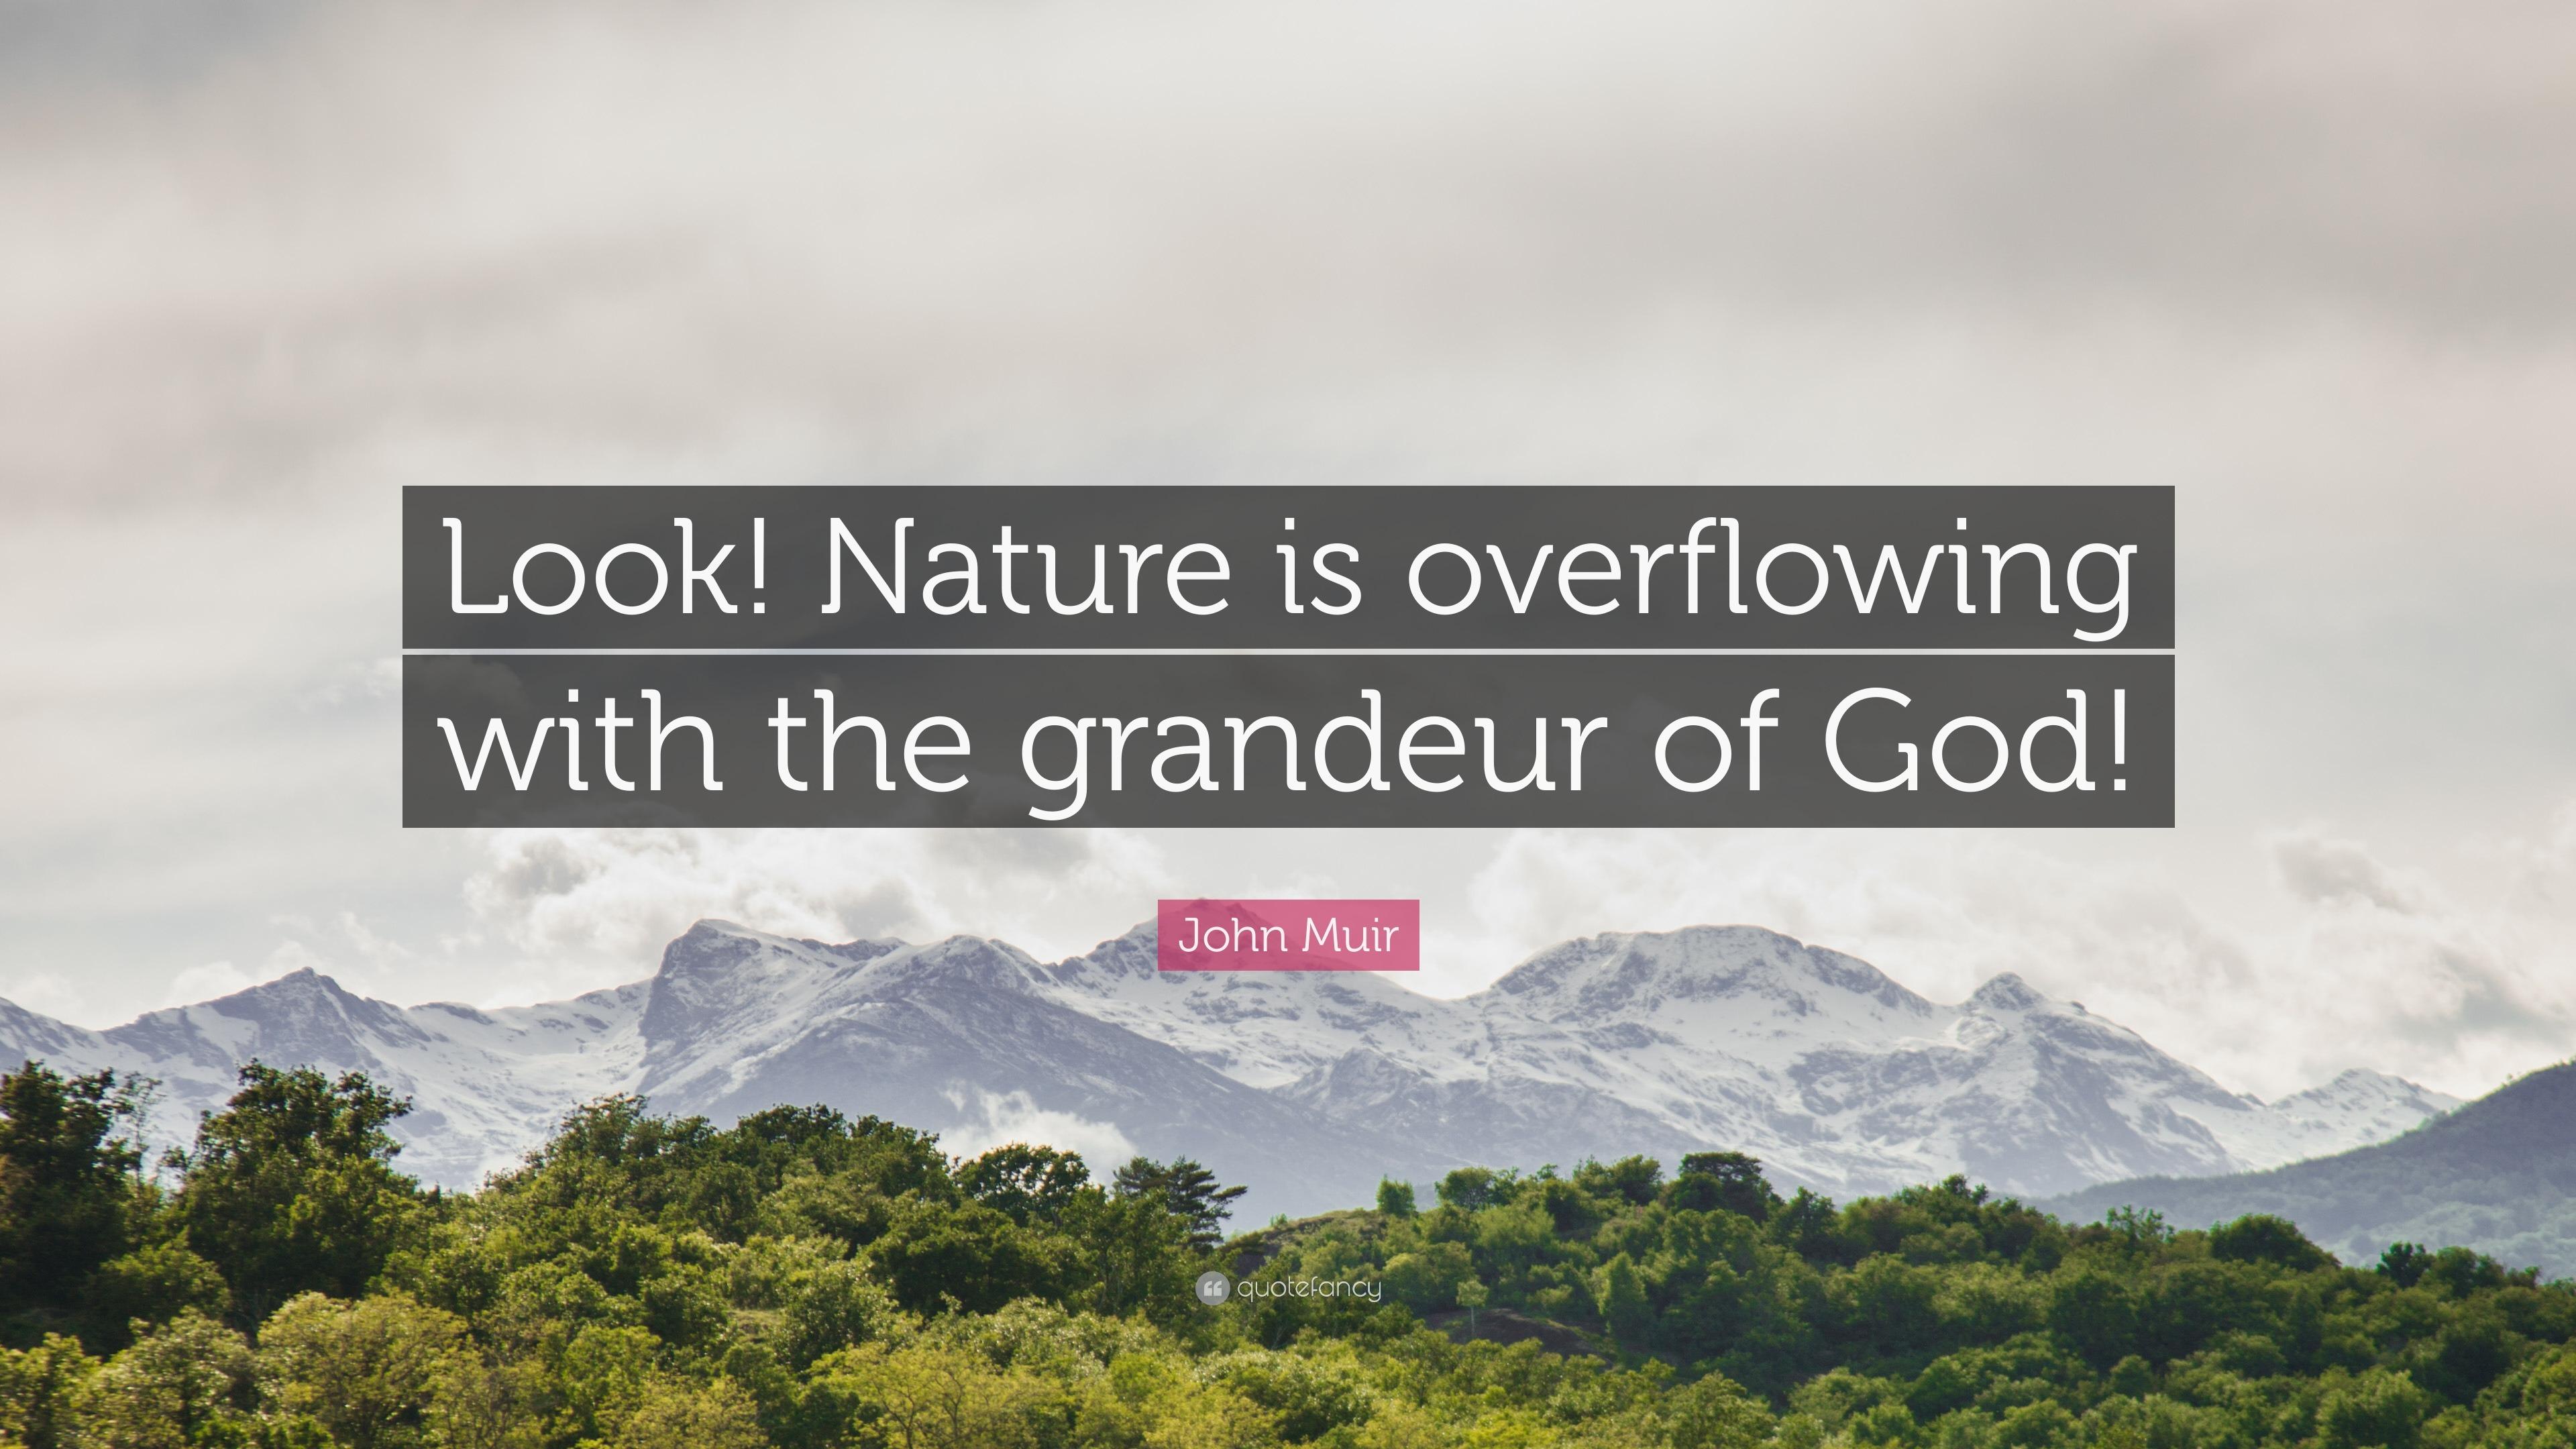 John Muir Quote Look Nature Is Overflowing With The Grandeur Of